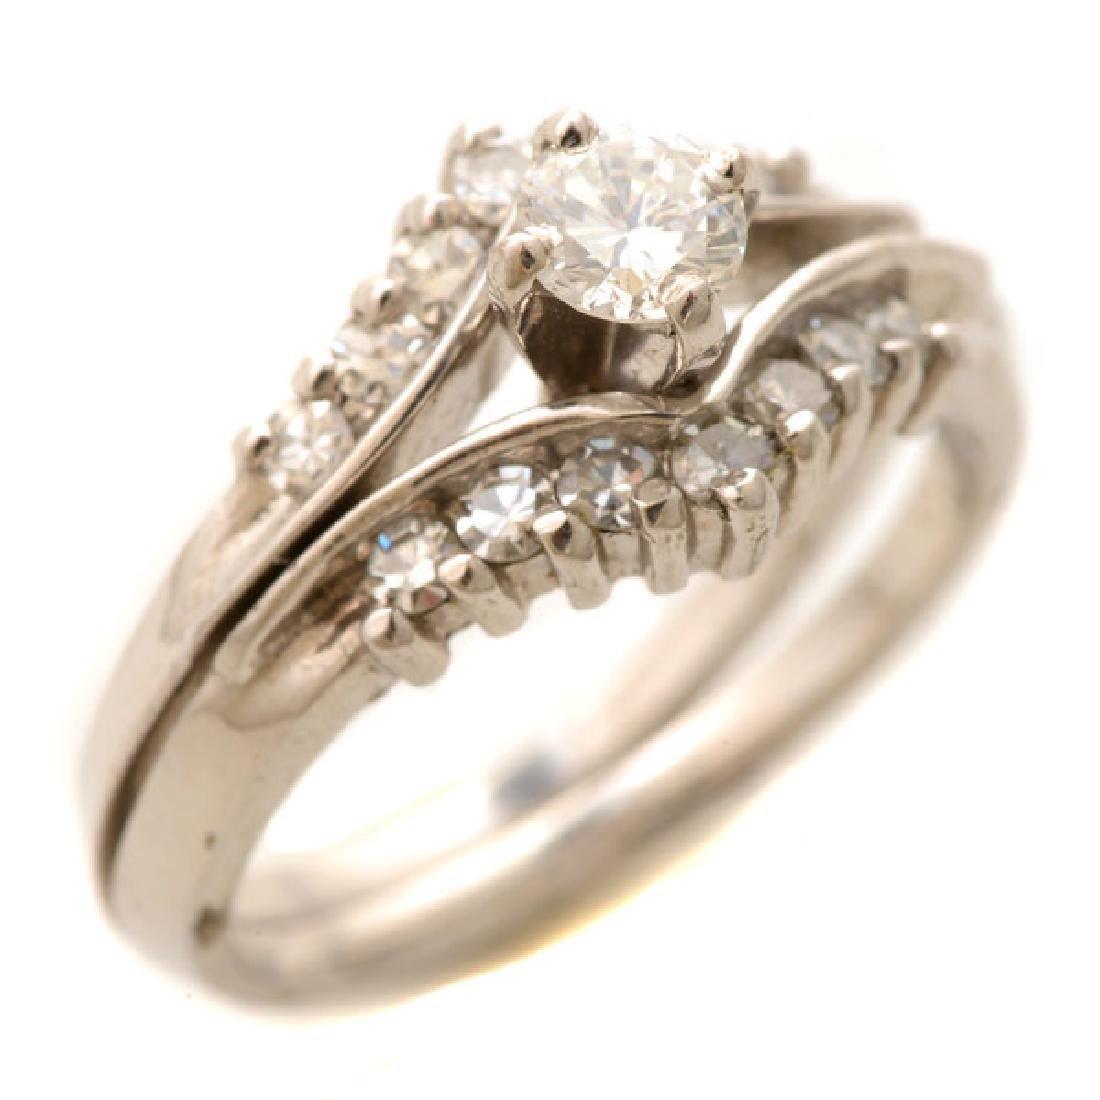 Diamond, 14k White Gold Ring Set.